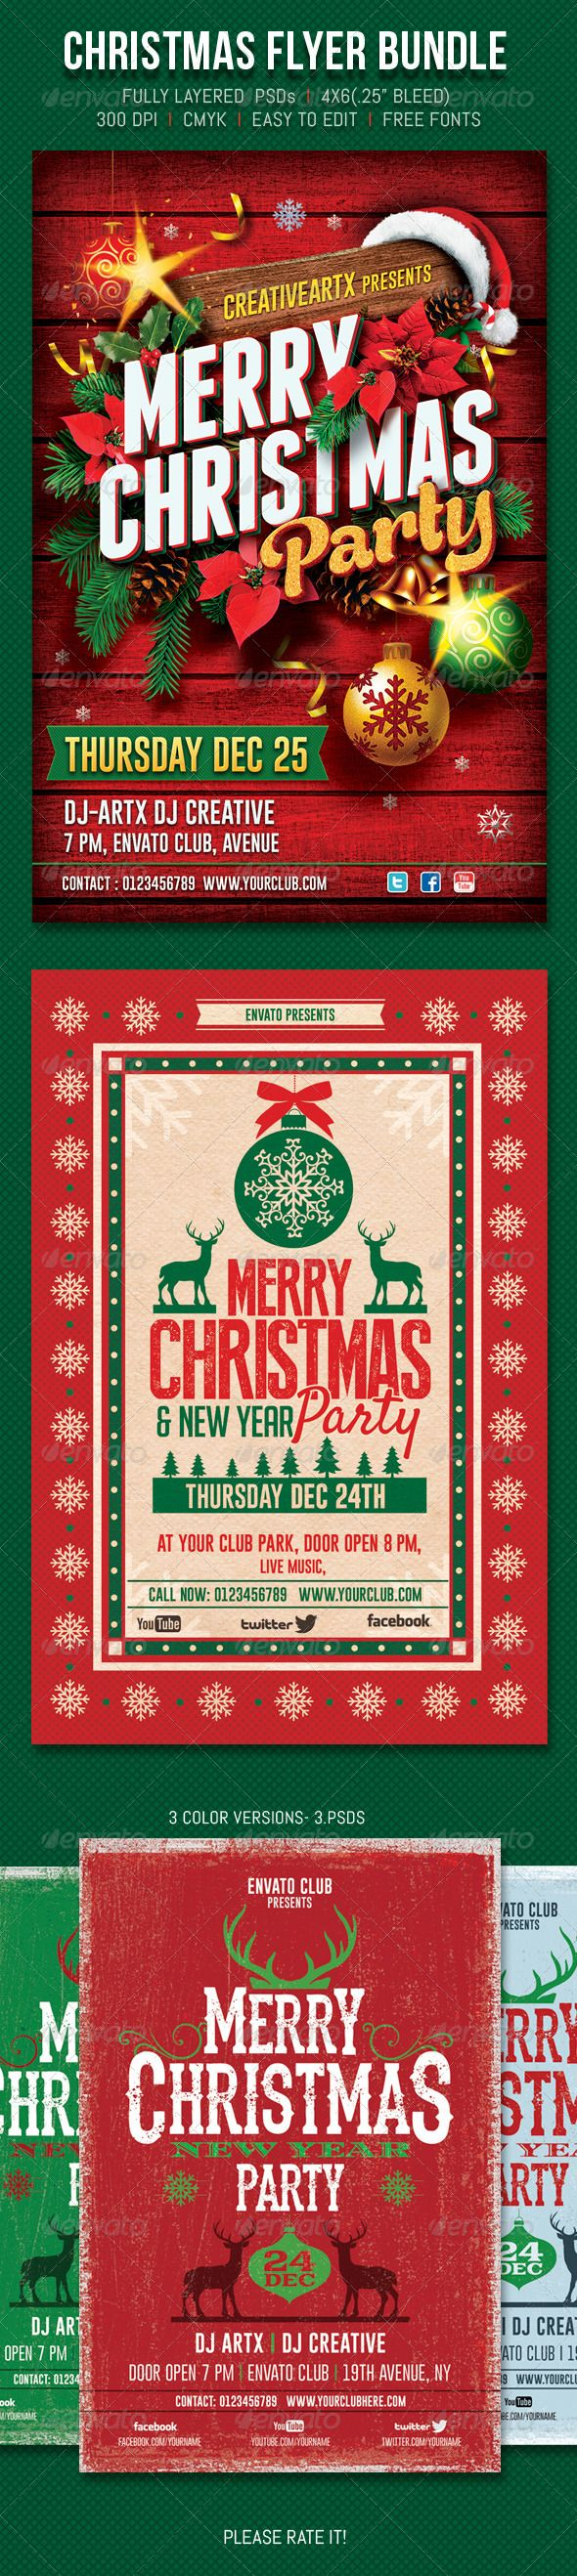 "Christmas Flyer Bundle #GraphicRiver 'Christmas Flyer Bundle' contents include – Fully layered 3 PSDs 4""x6"" (.25"" bleed) CMYK -Print Ready, 300 DPI Christmas Flyer Bundle contained: graphicriver /item/christmas-party-flyer/6053479?WT.ac=portfolio&WT.seg_1=portfolio&WT.z_author=creativeartx graphicriver /item/christmas-party/6003043?WT.ac=portfolio&WT.seg_1=portfolio&WT.z_author=creativeartx graphicriver /item/christmas-party/6109331?WT.ac=portfolio&WT.seg_1=portfolio&WT.z_author=creativeartx…"